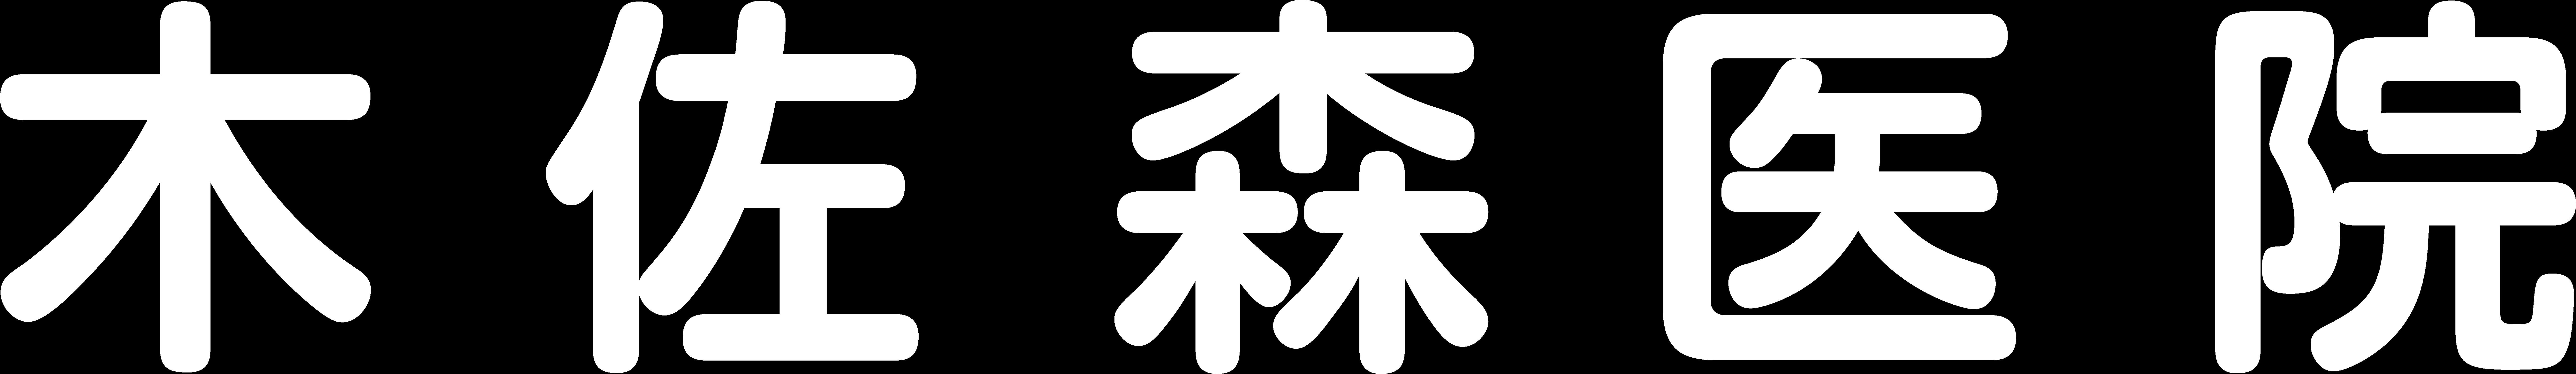 木佐森医院ロゴ